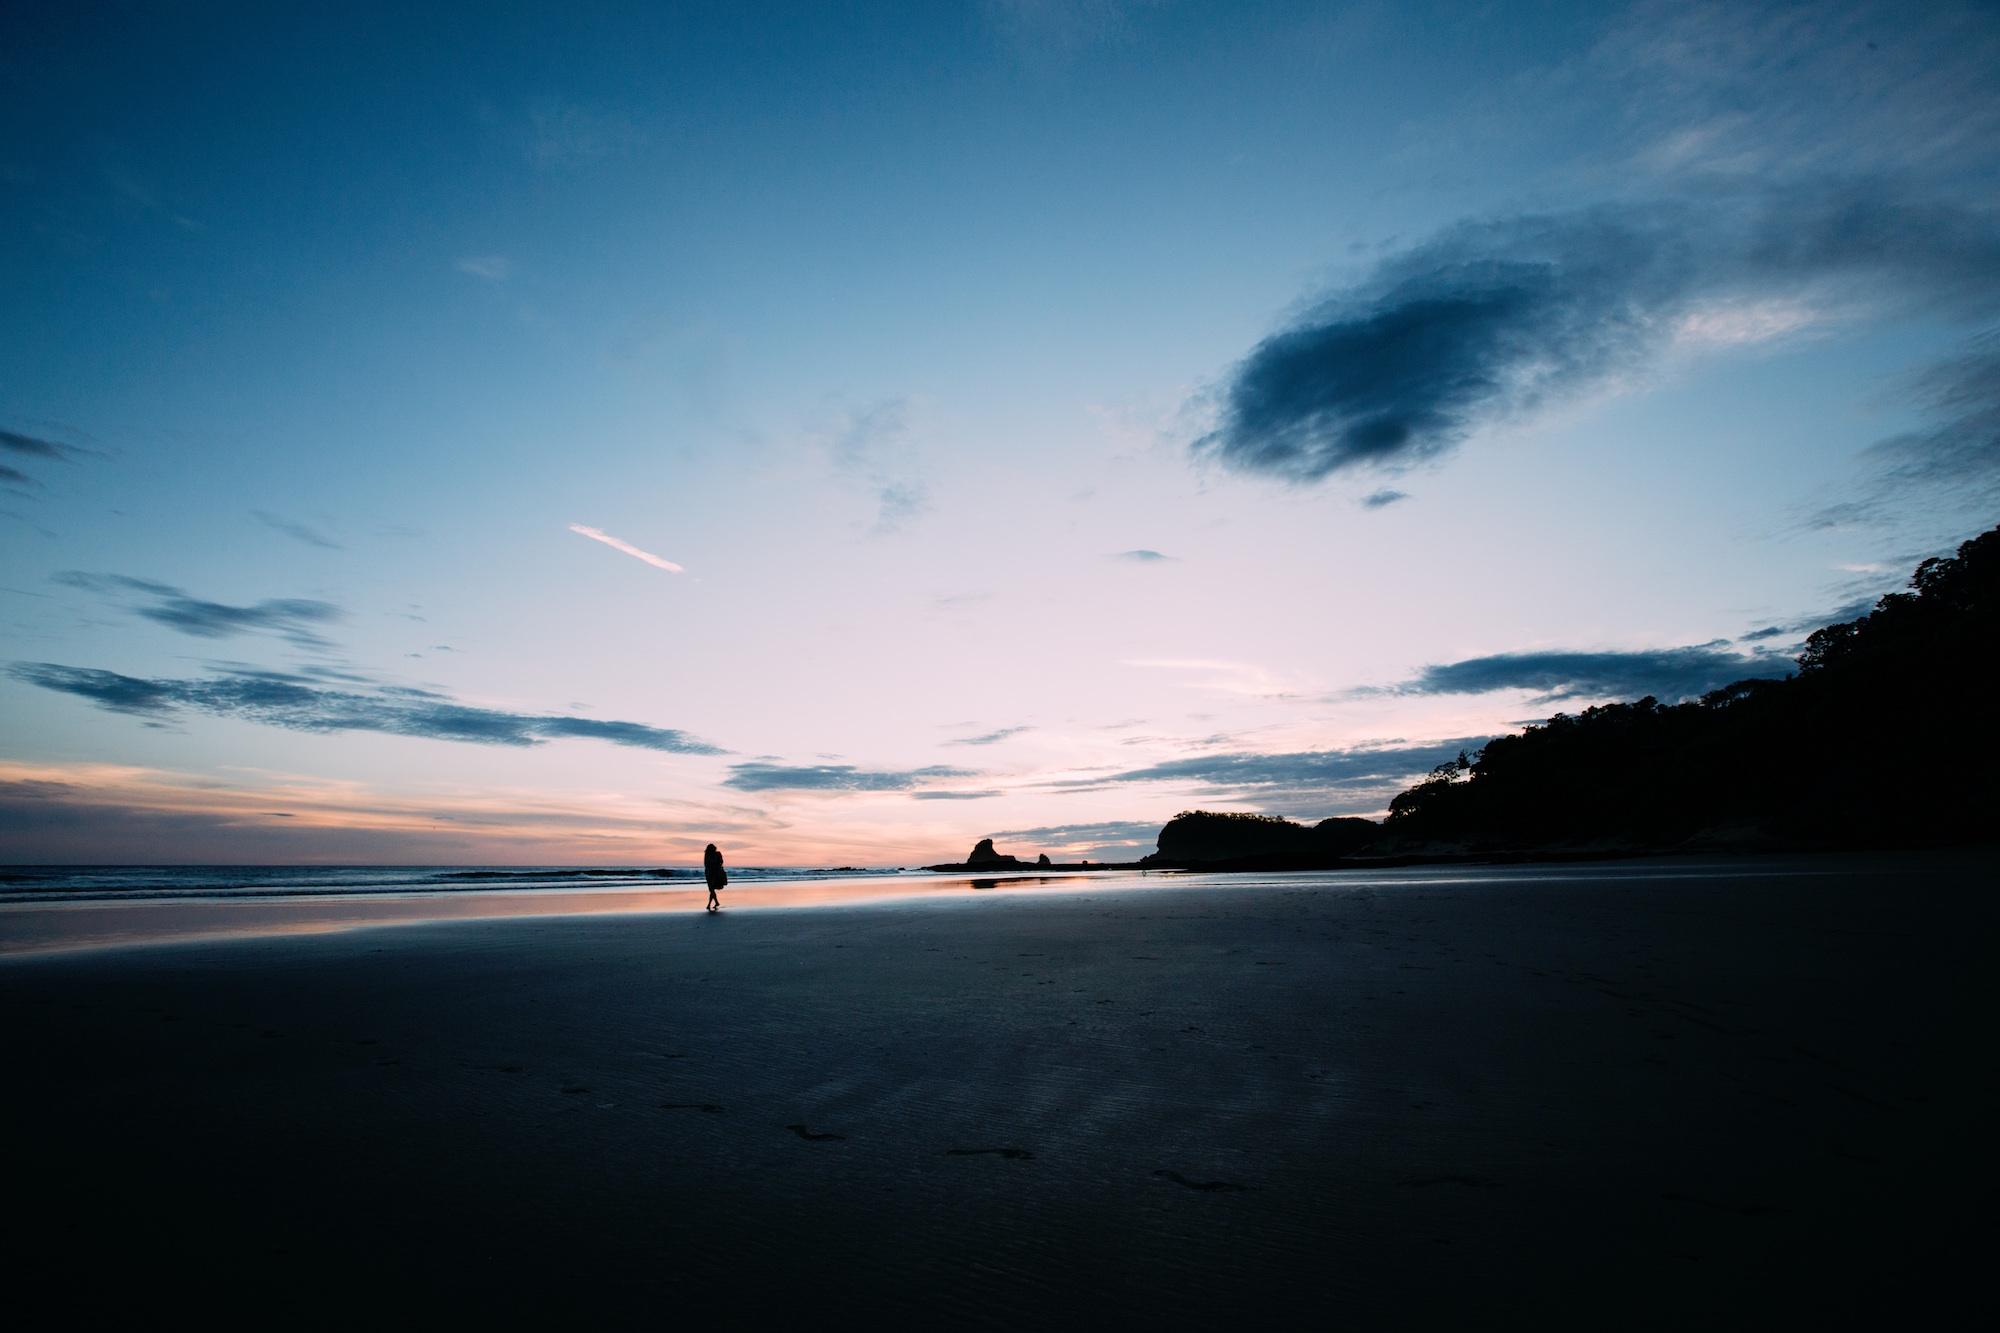 Nicaragua Beaches © Jason Briscoe/Unsplash